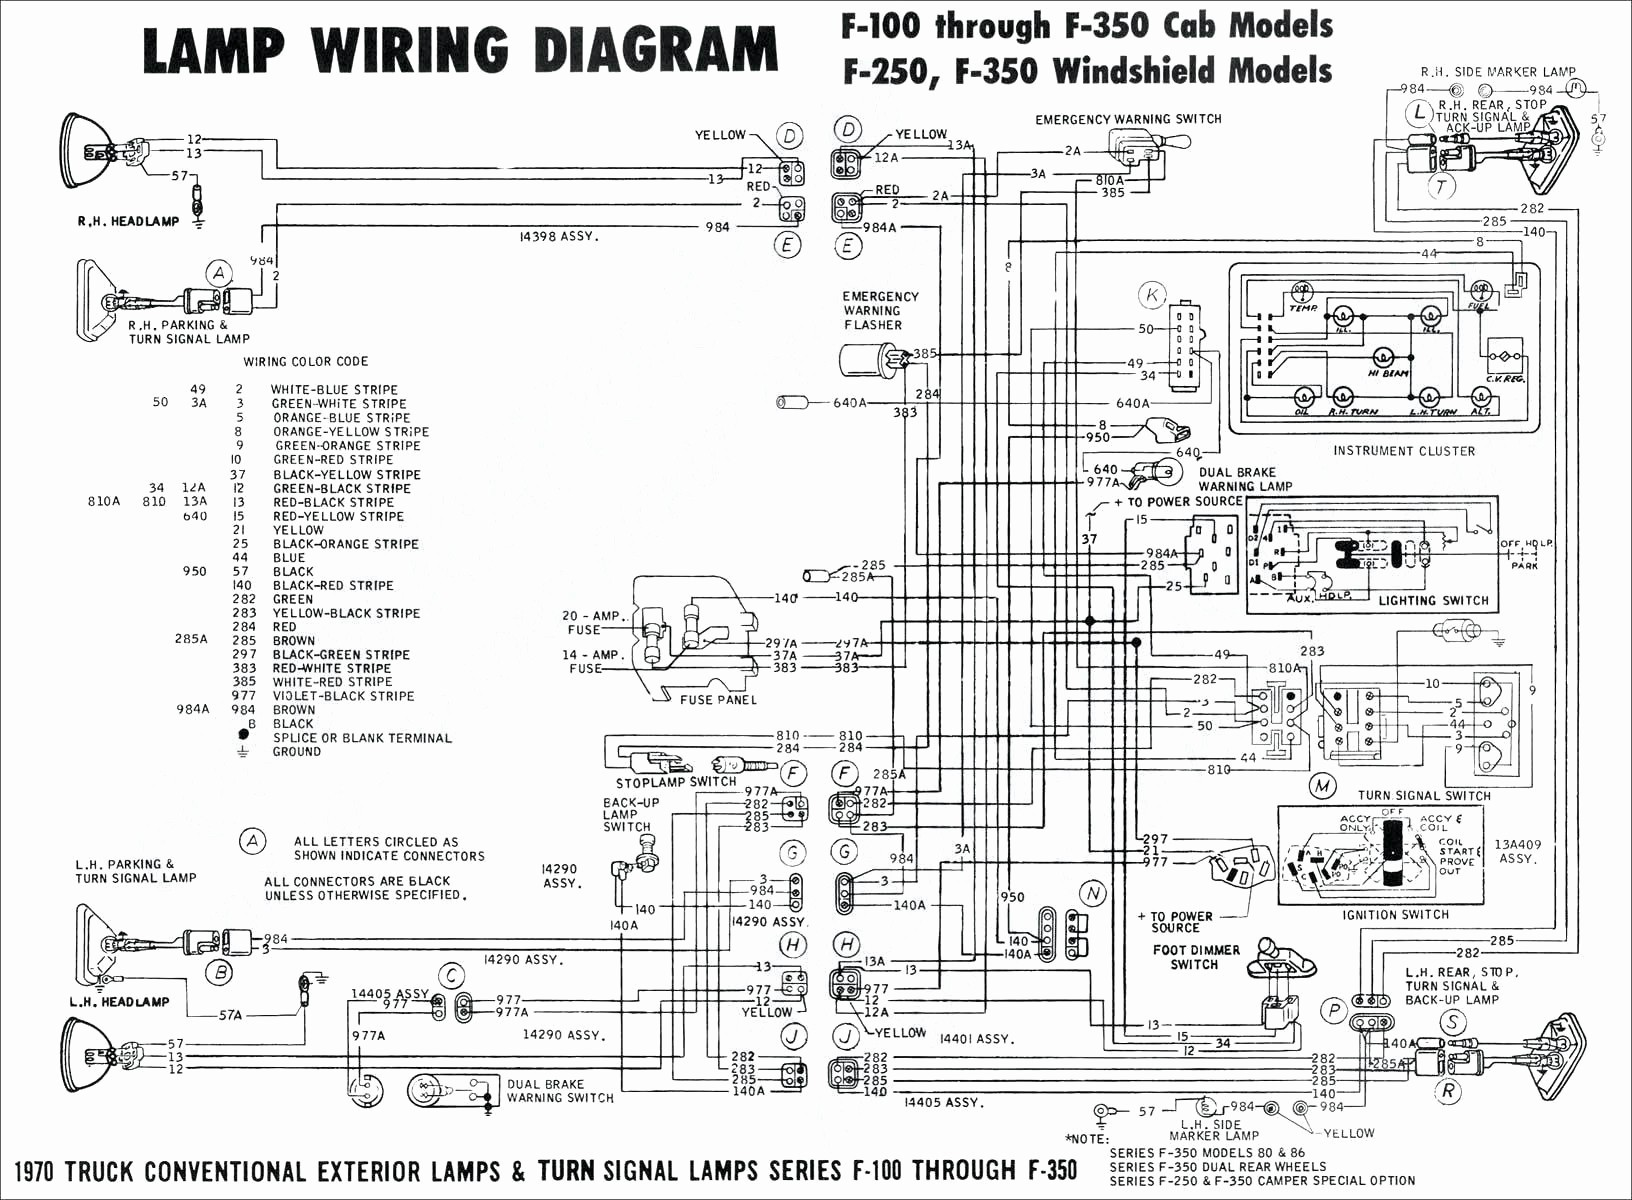 300zx Engine Diagram 97 Mazda 626 Engine Diagram Worksheet